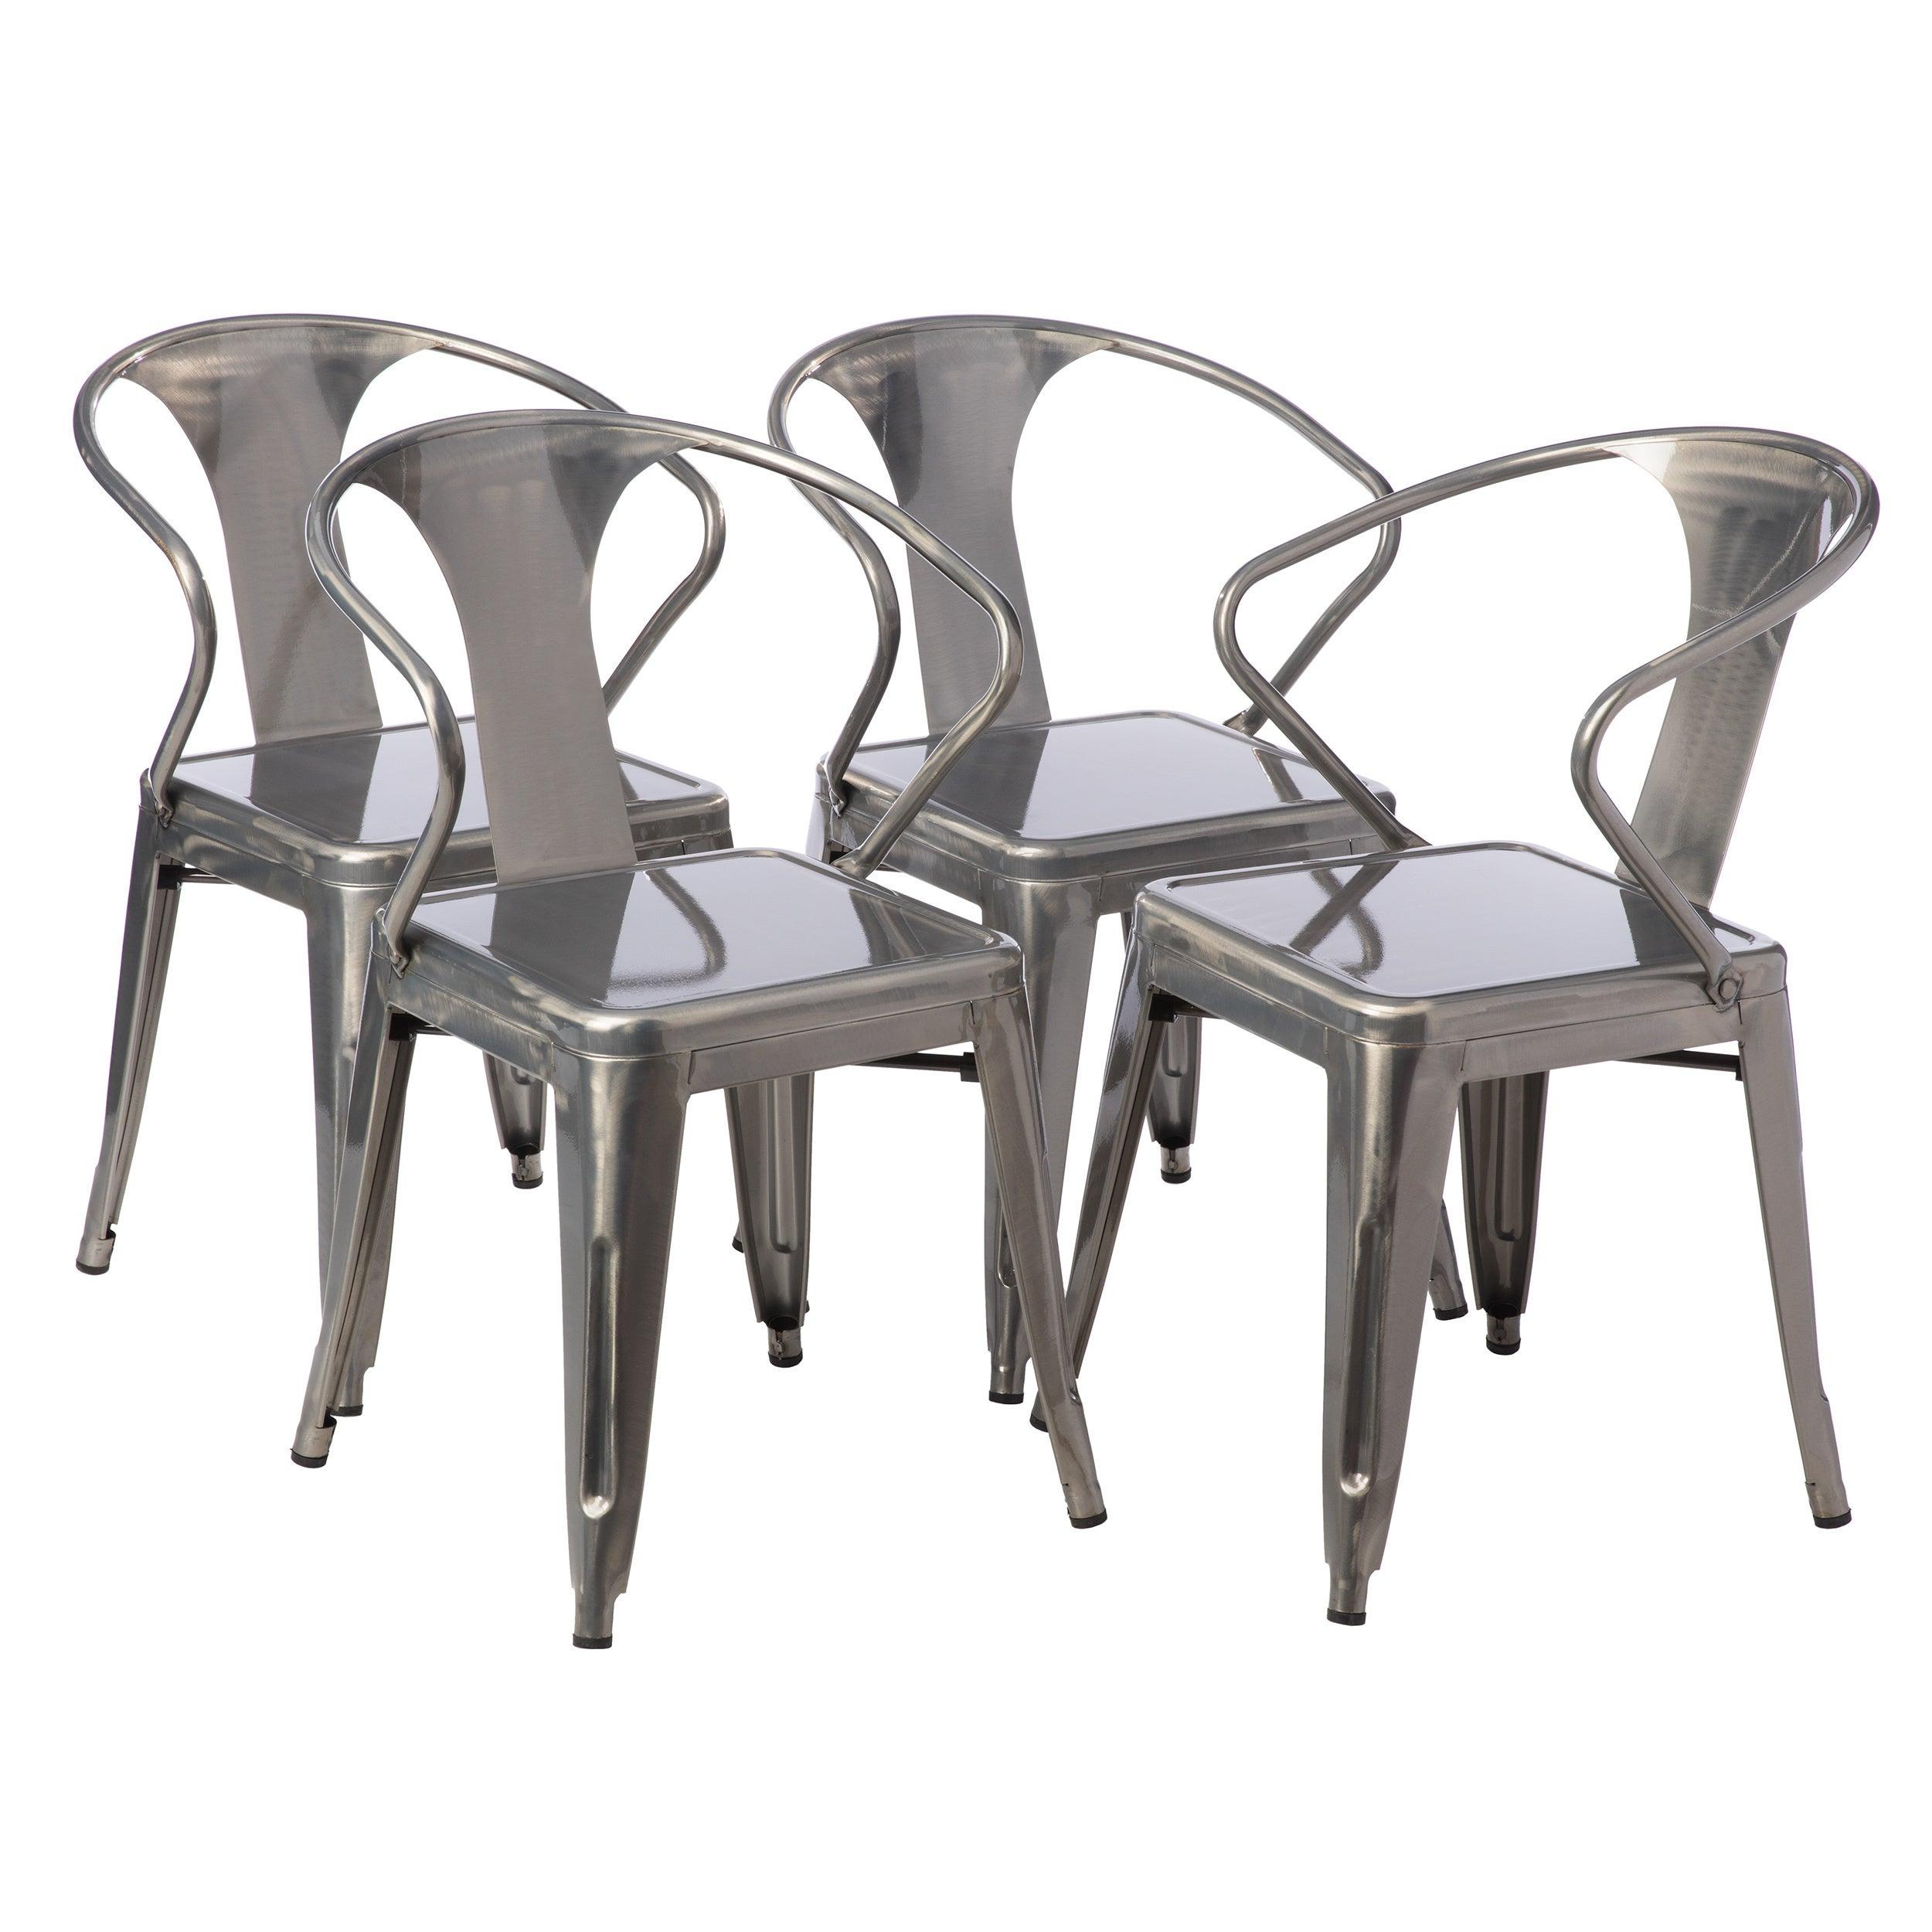 Carbon Loft Gunmetal Tabouret Stacking Chair Set of 4 Free